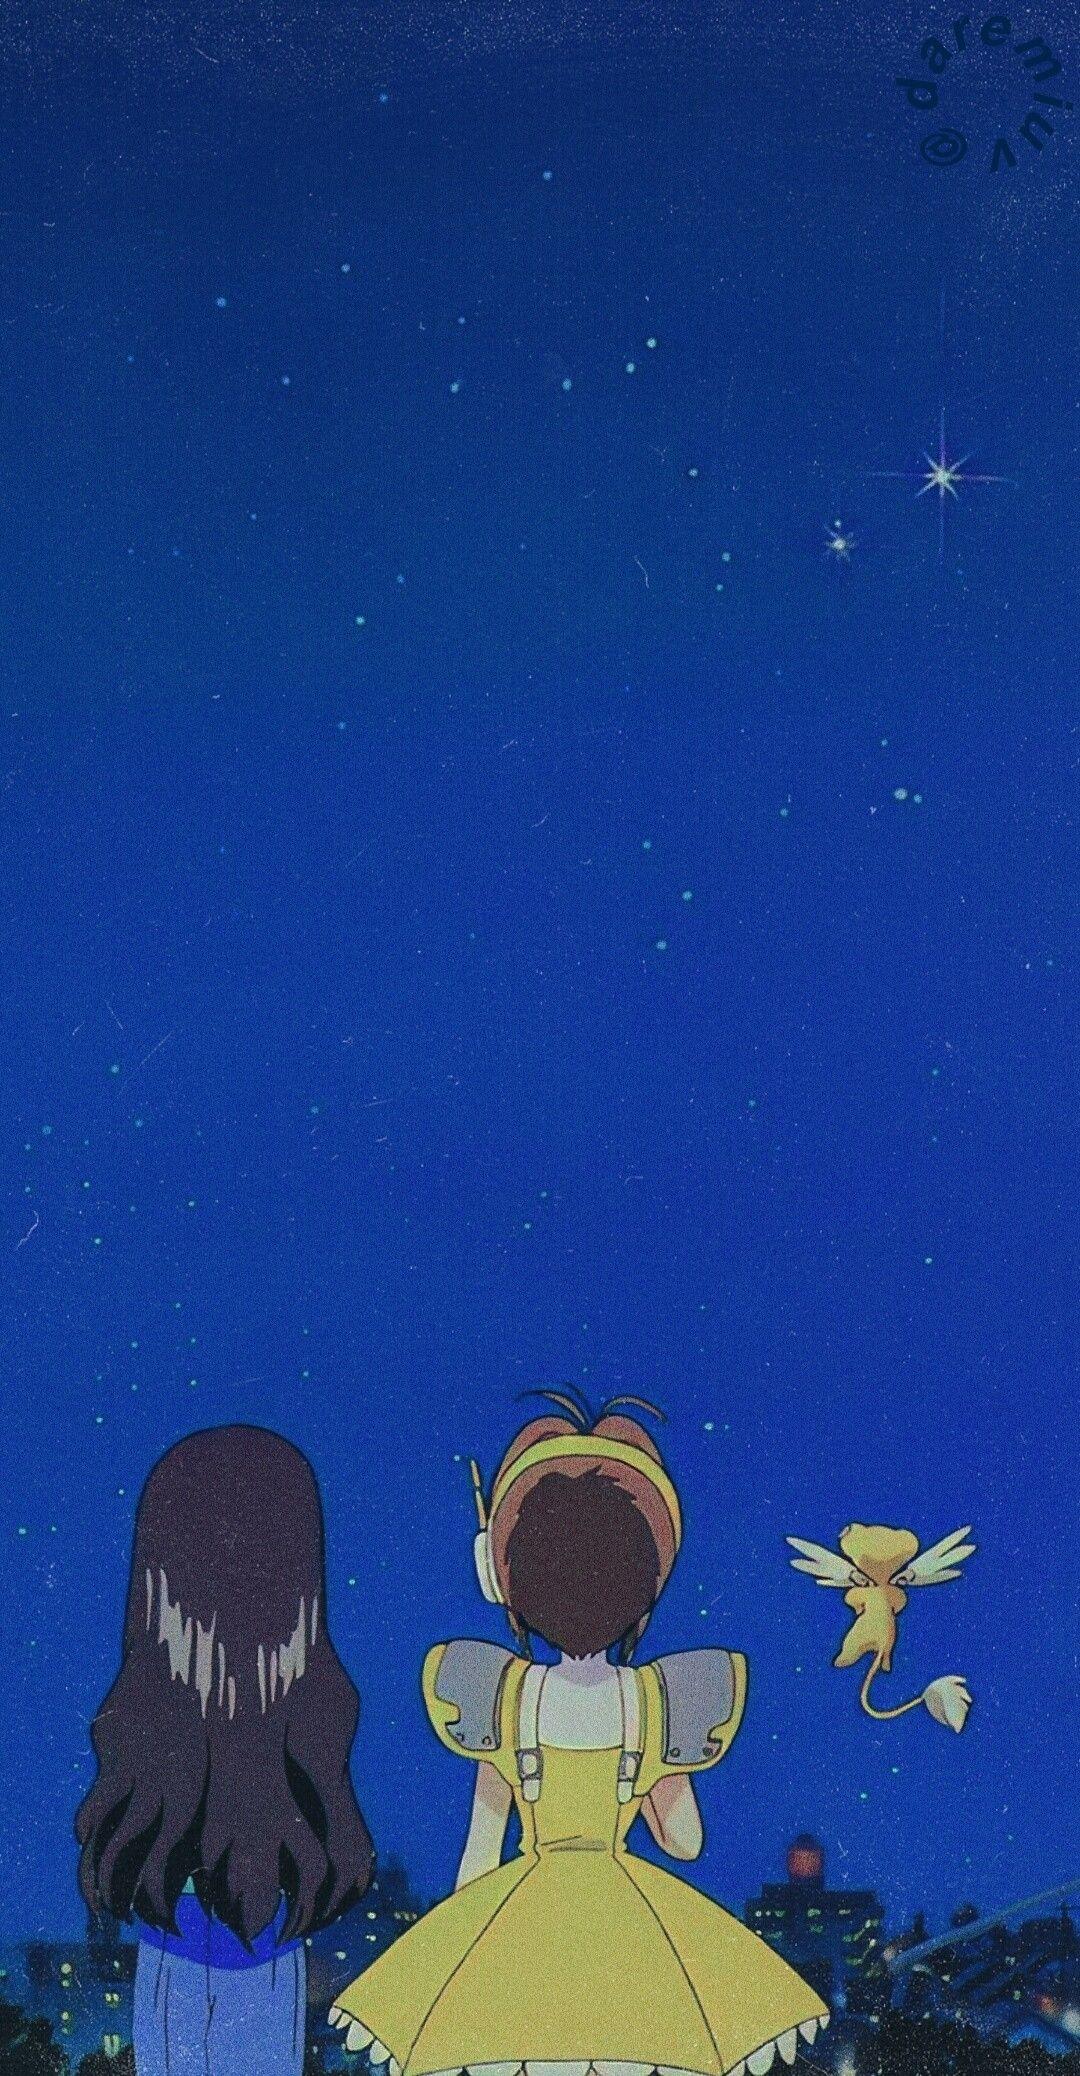 Lock Screen Anime Kawaii Iphone Wallpapers 42 Best Ideas Screen Anime Wallpaper Iphone Cute Anime Wallpaper Anime Wallpaper